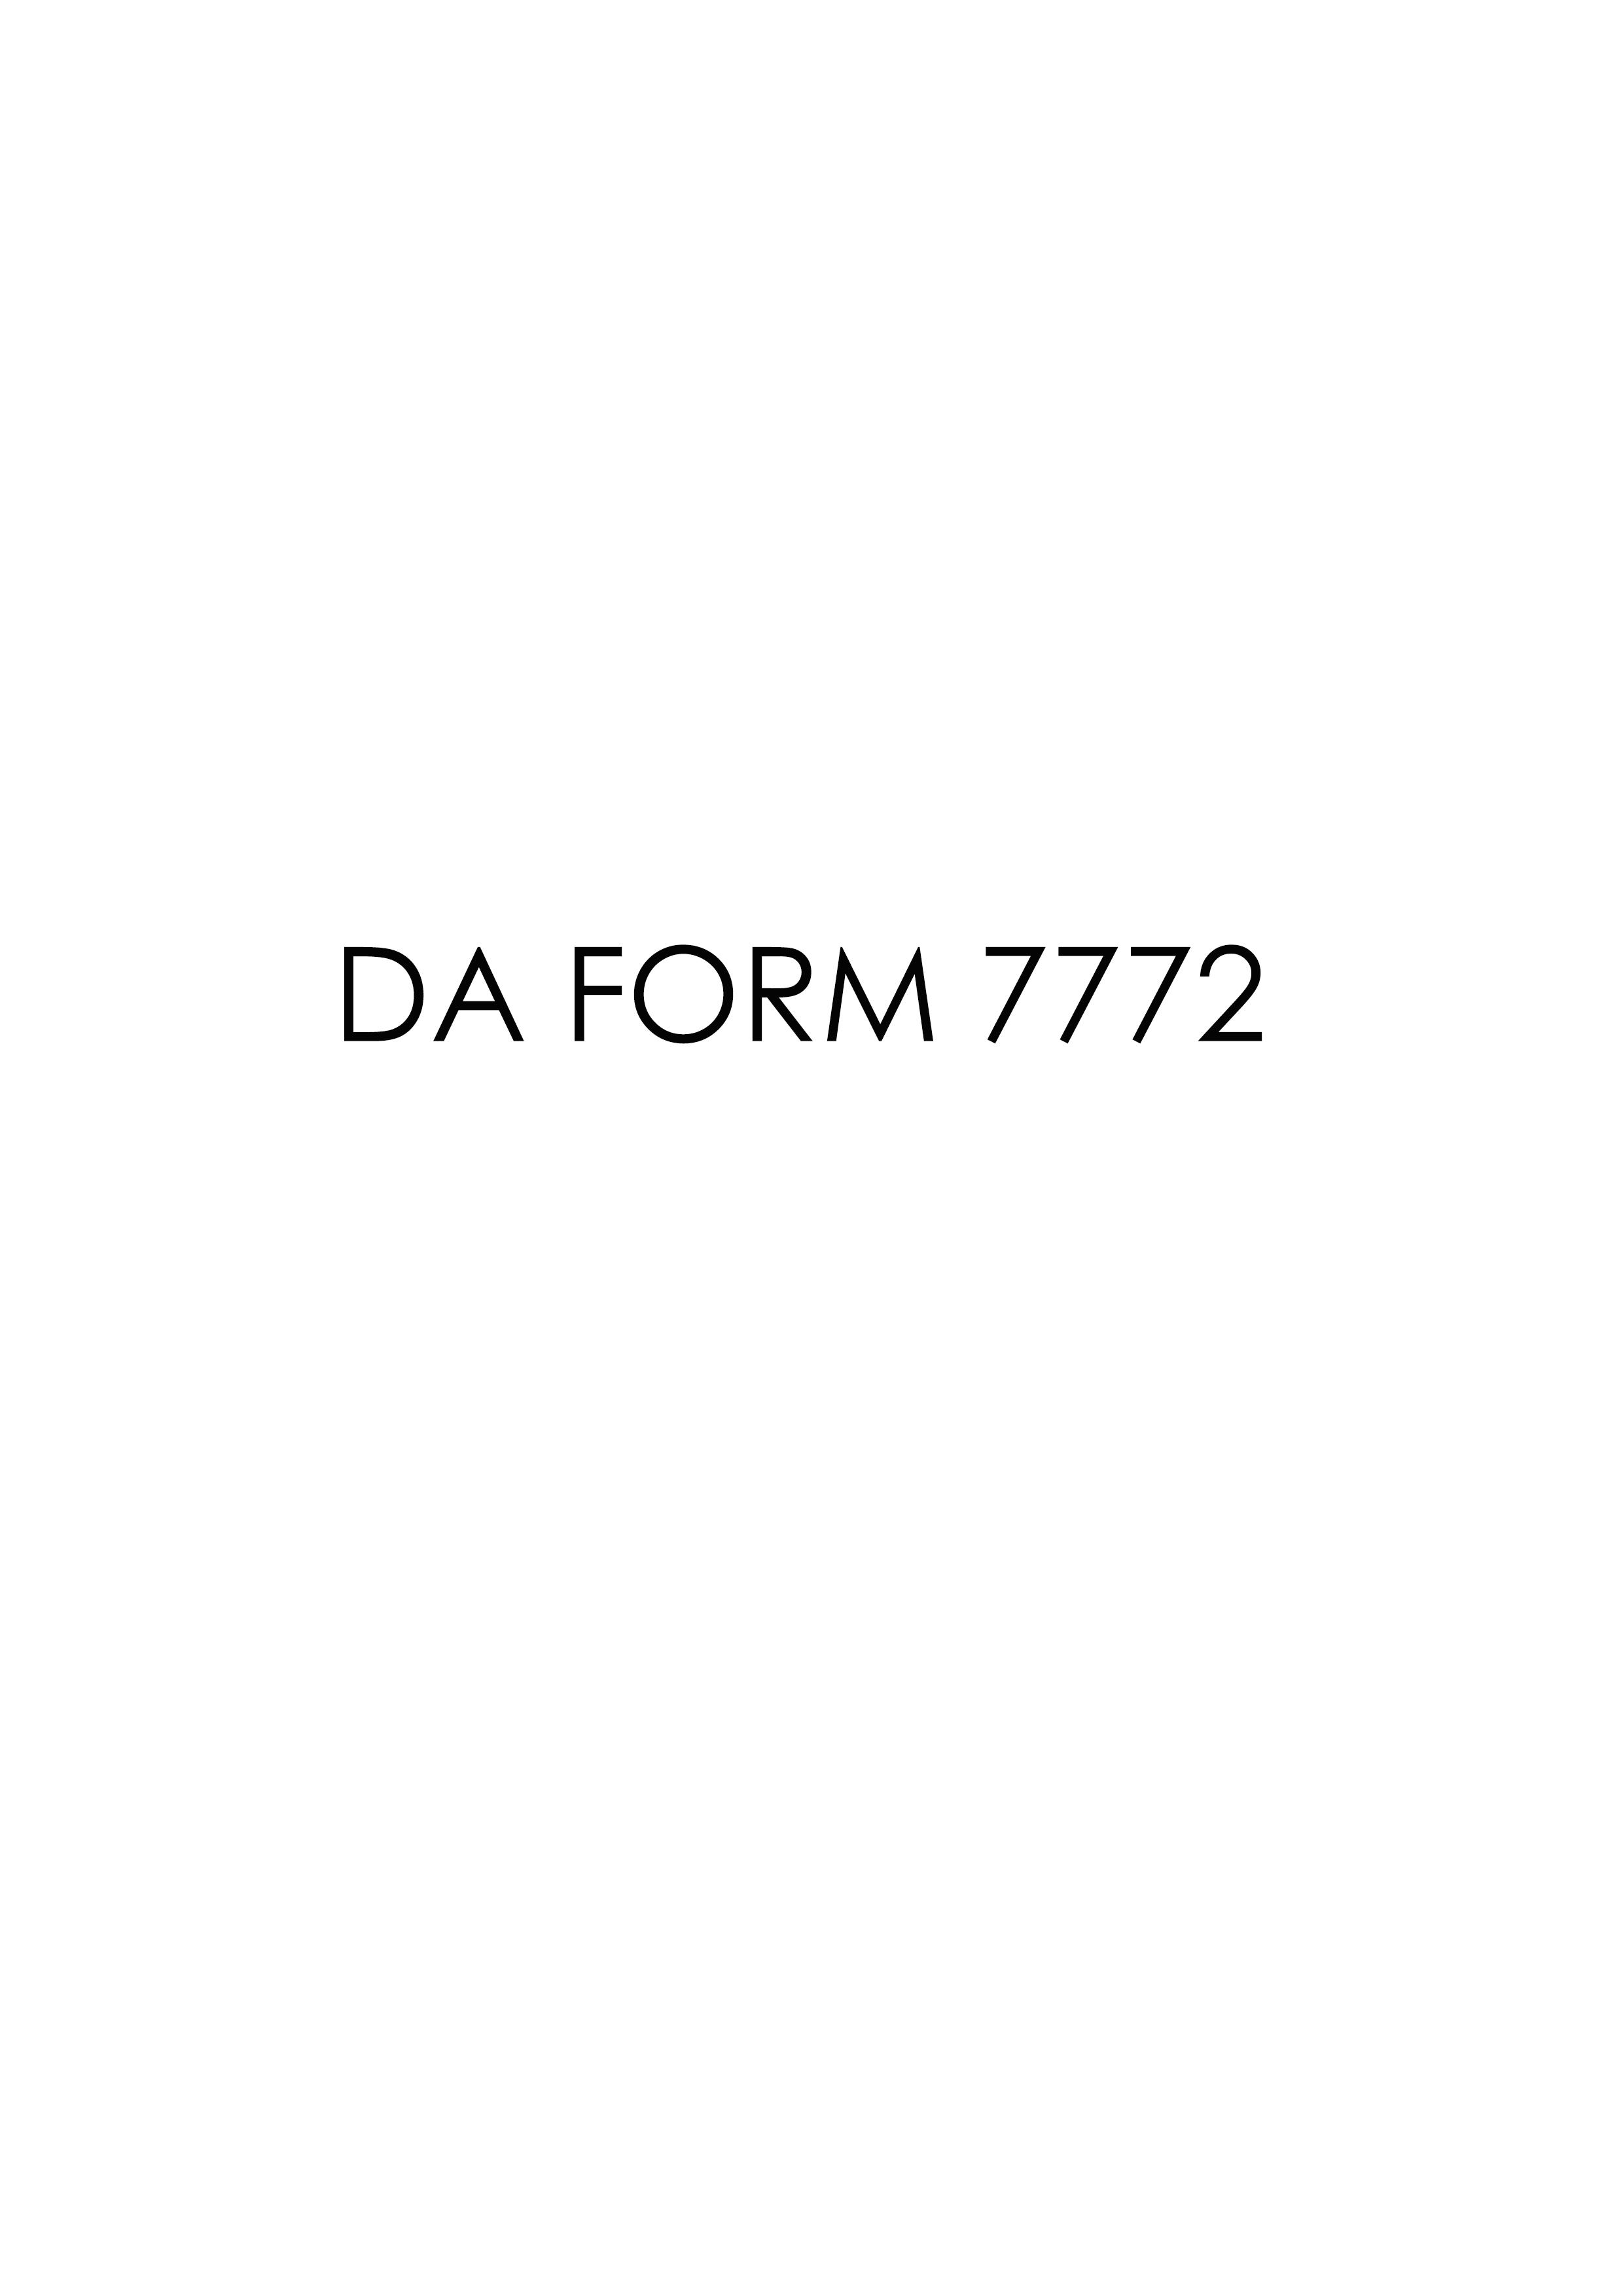 Download da Form 7772 Free